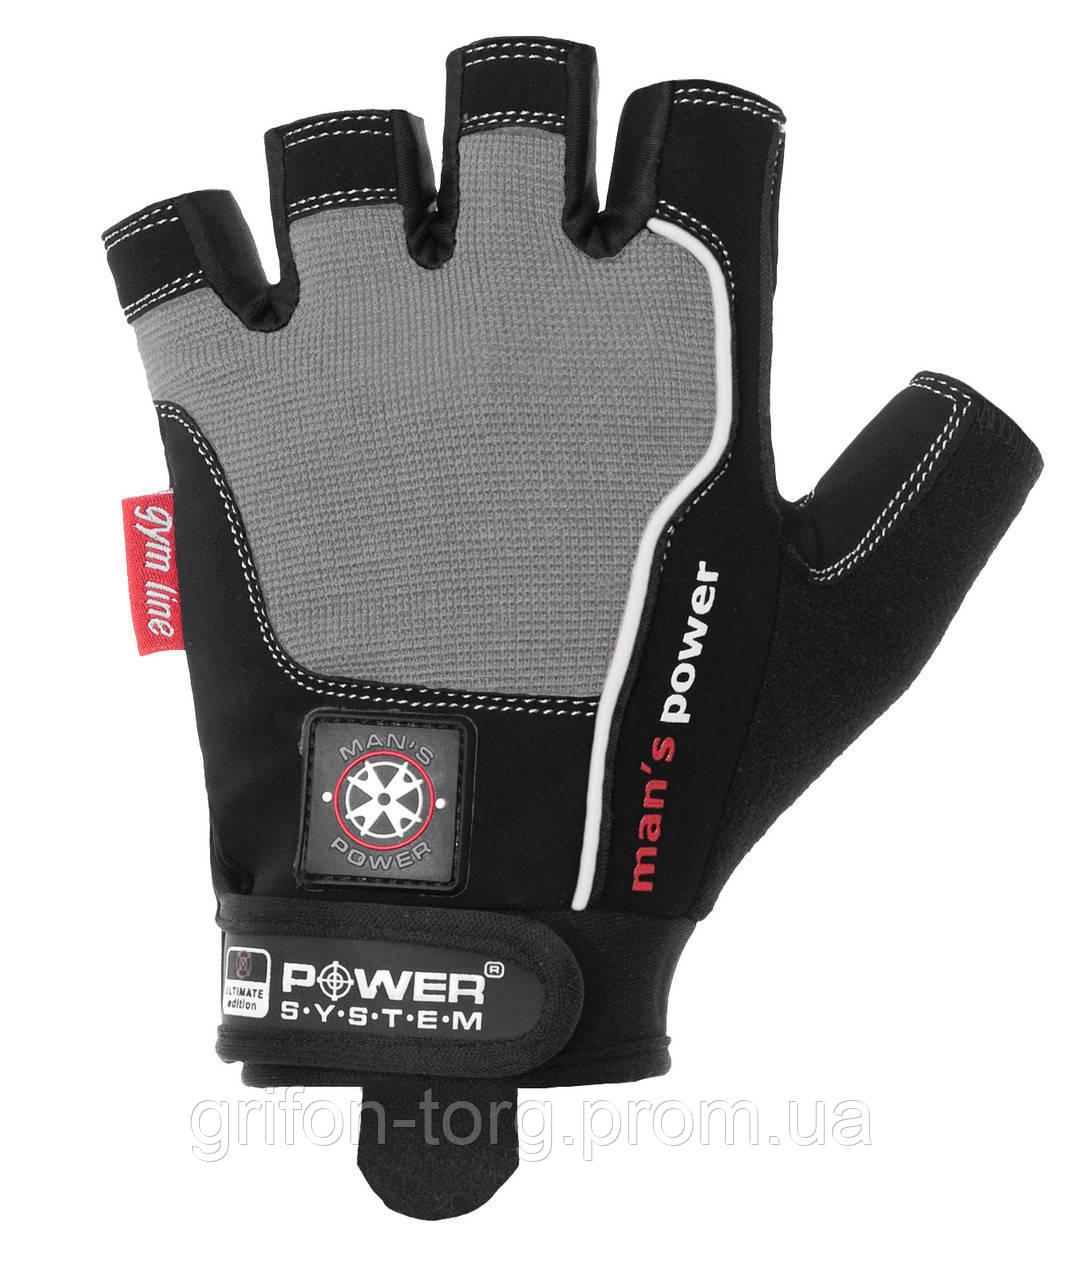 Перчатки для фитнеса и тяжелой атлетики Power System Man's Power PS-2580 XXL Black/Grey